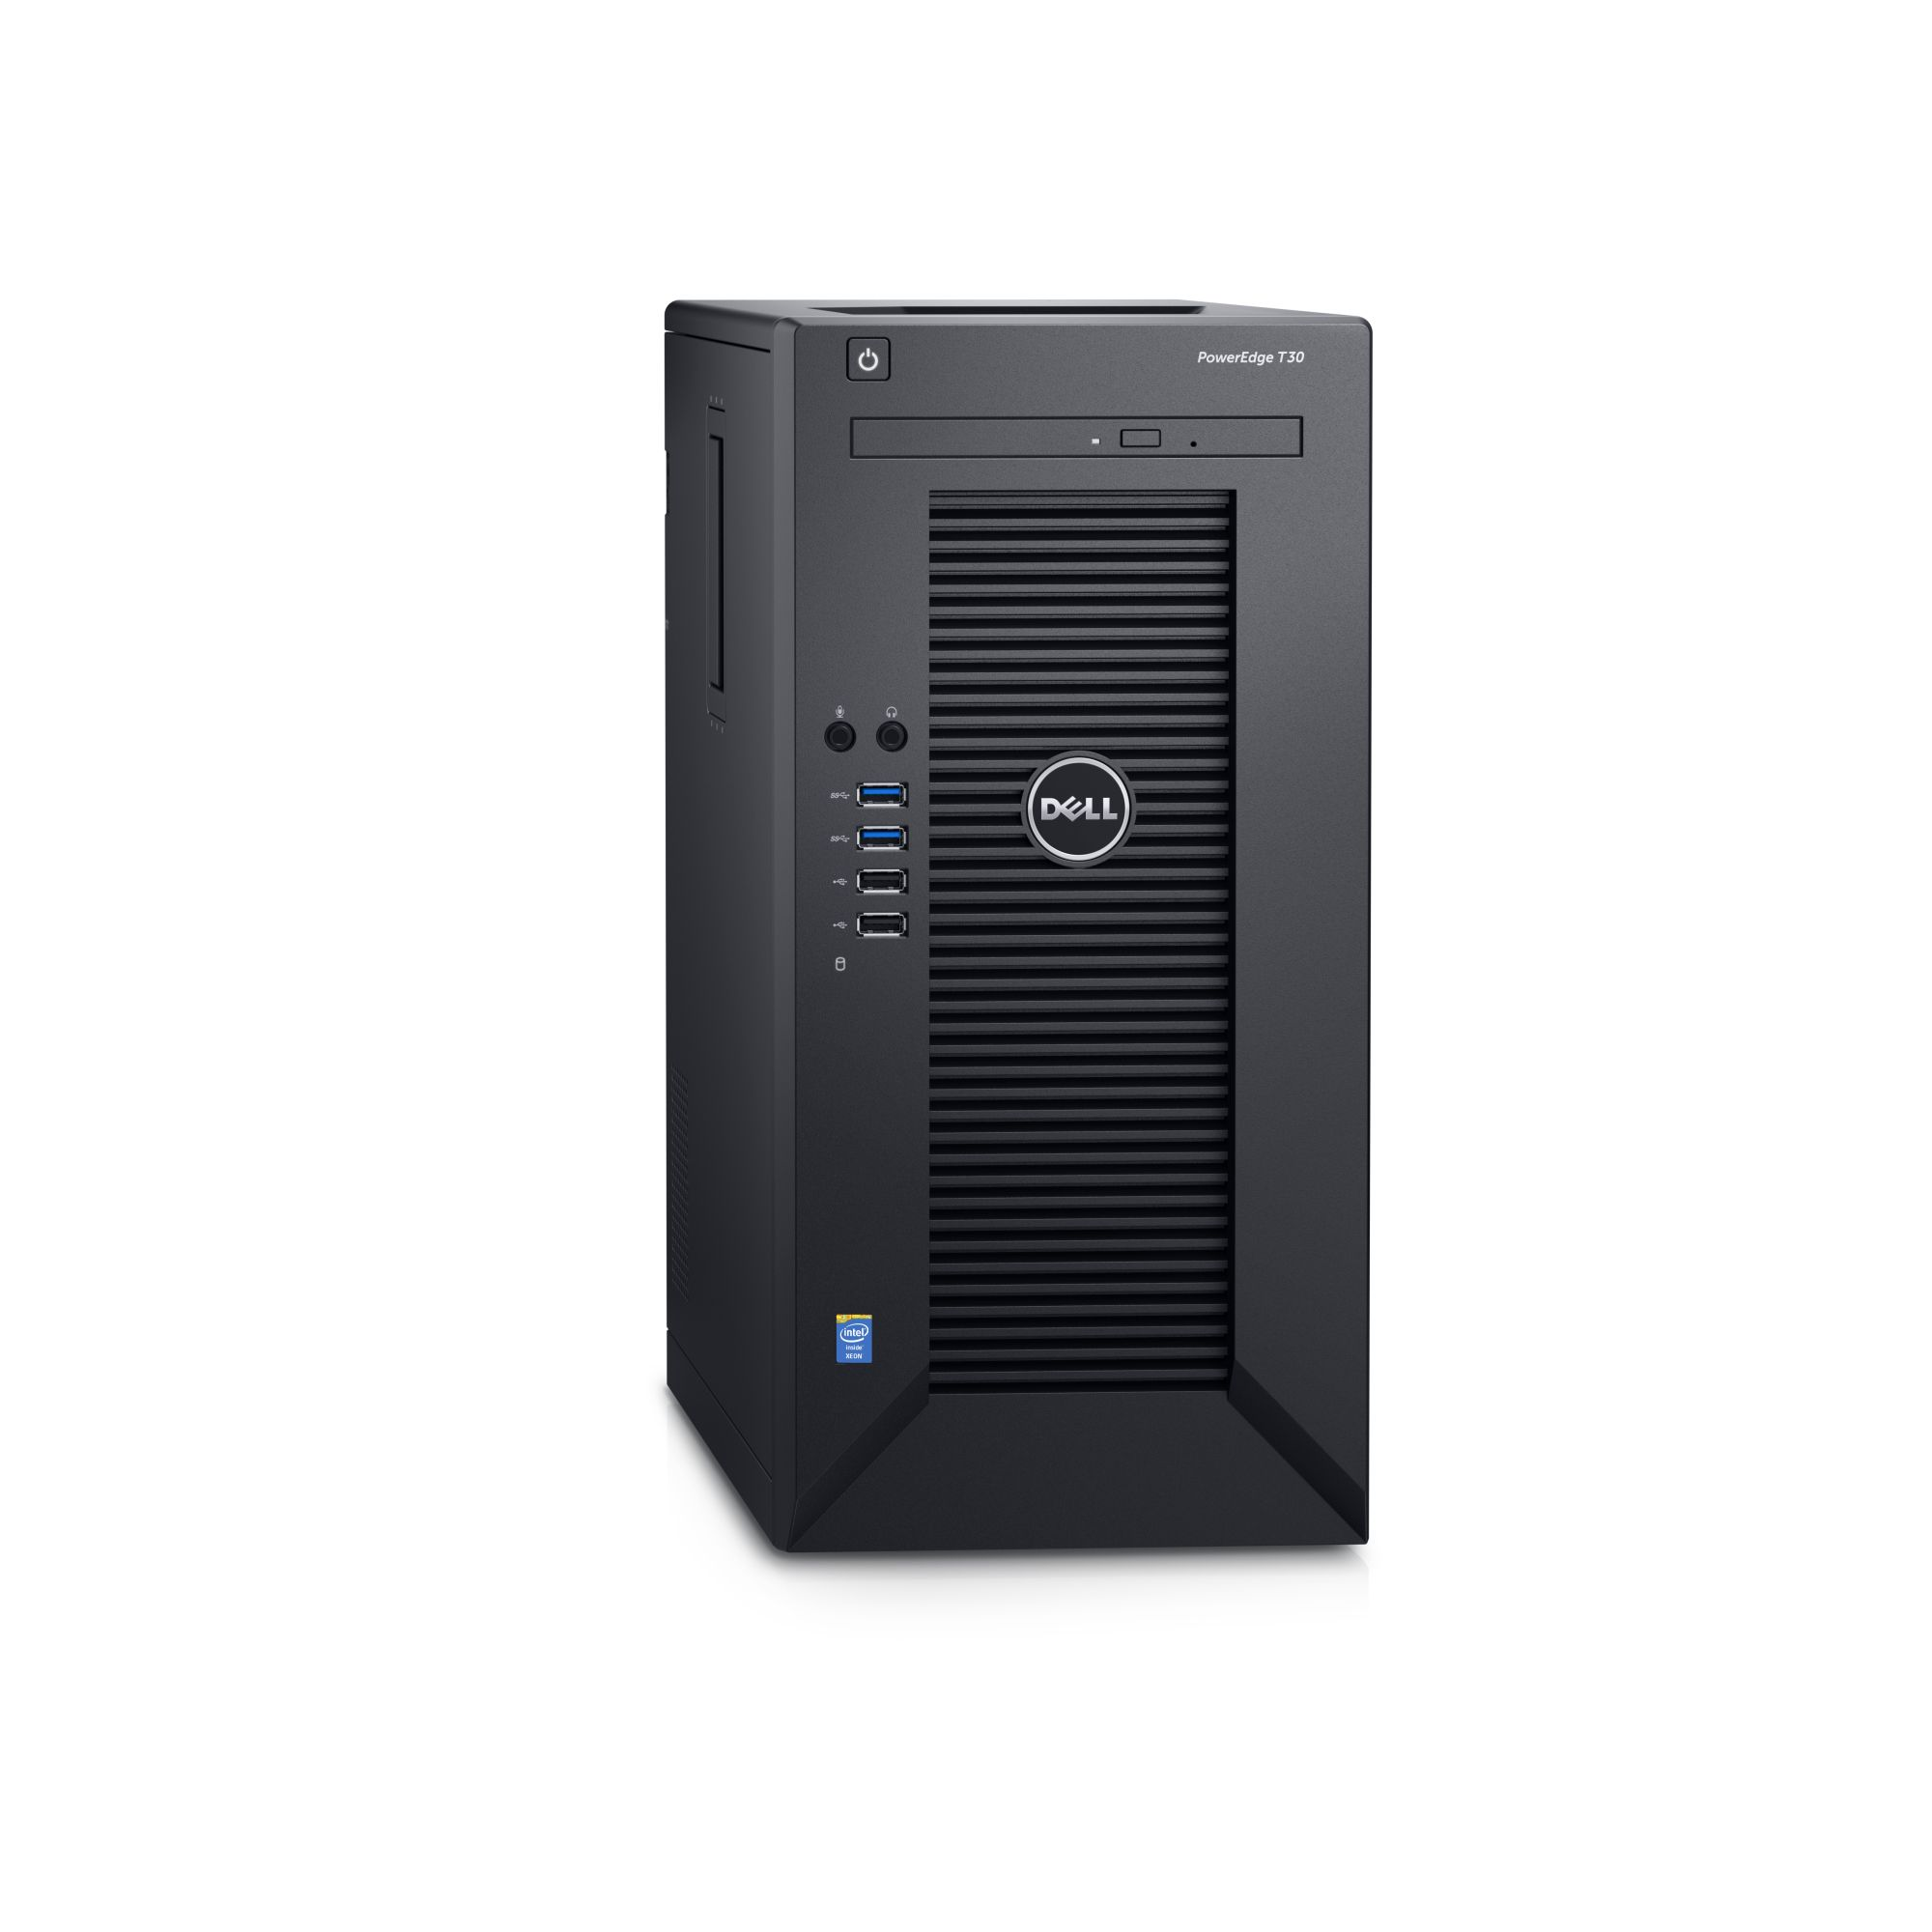 Dell PowerEdge T30 E3-1225 v5/32GB/4x1TB SATA/RAID 5/DVDRW/3xGLAN/290W/3RNBD/Černý